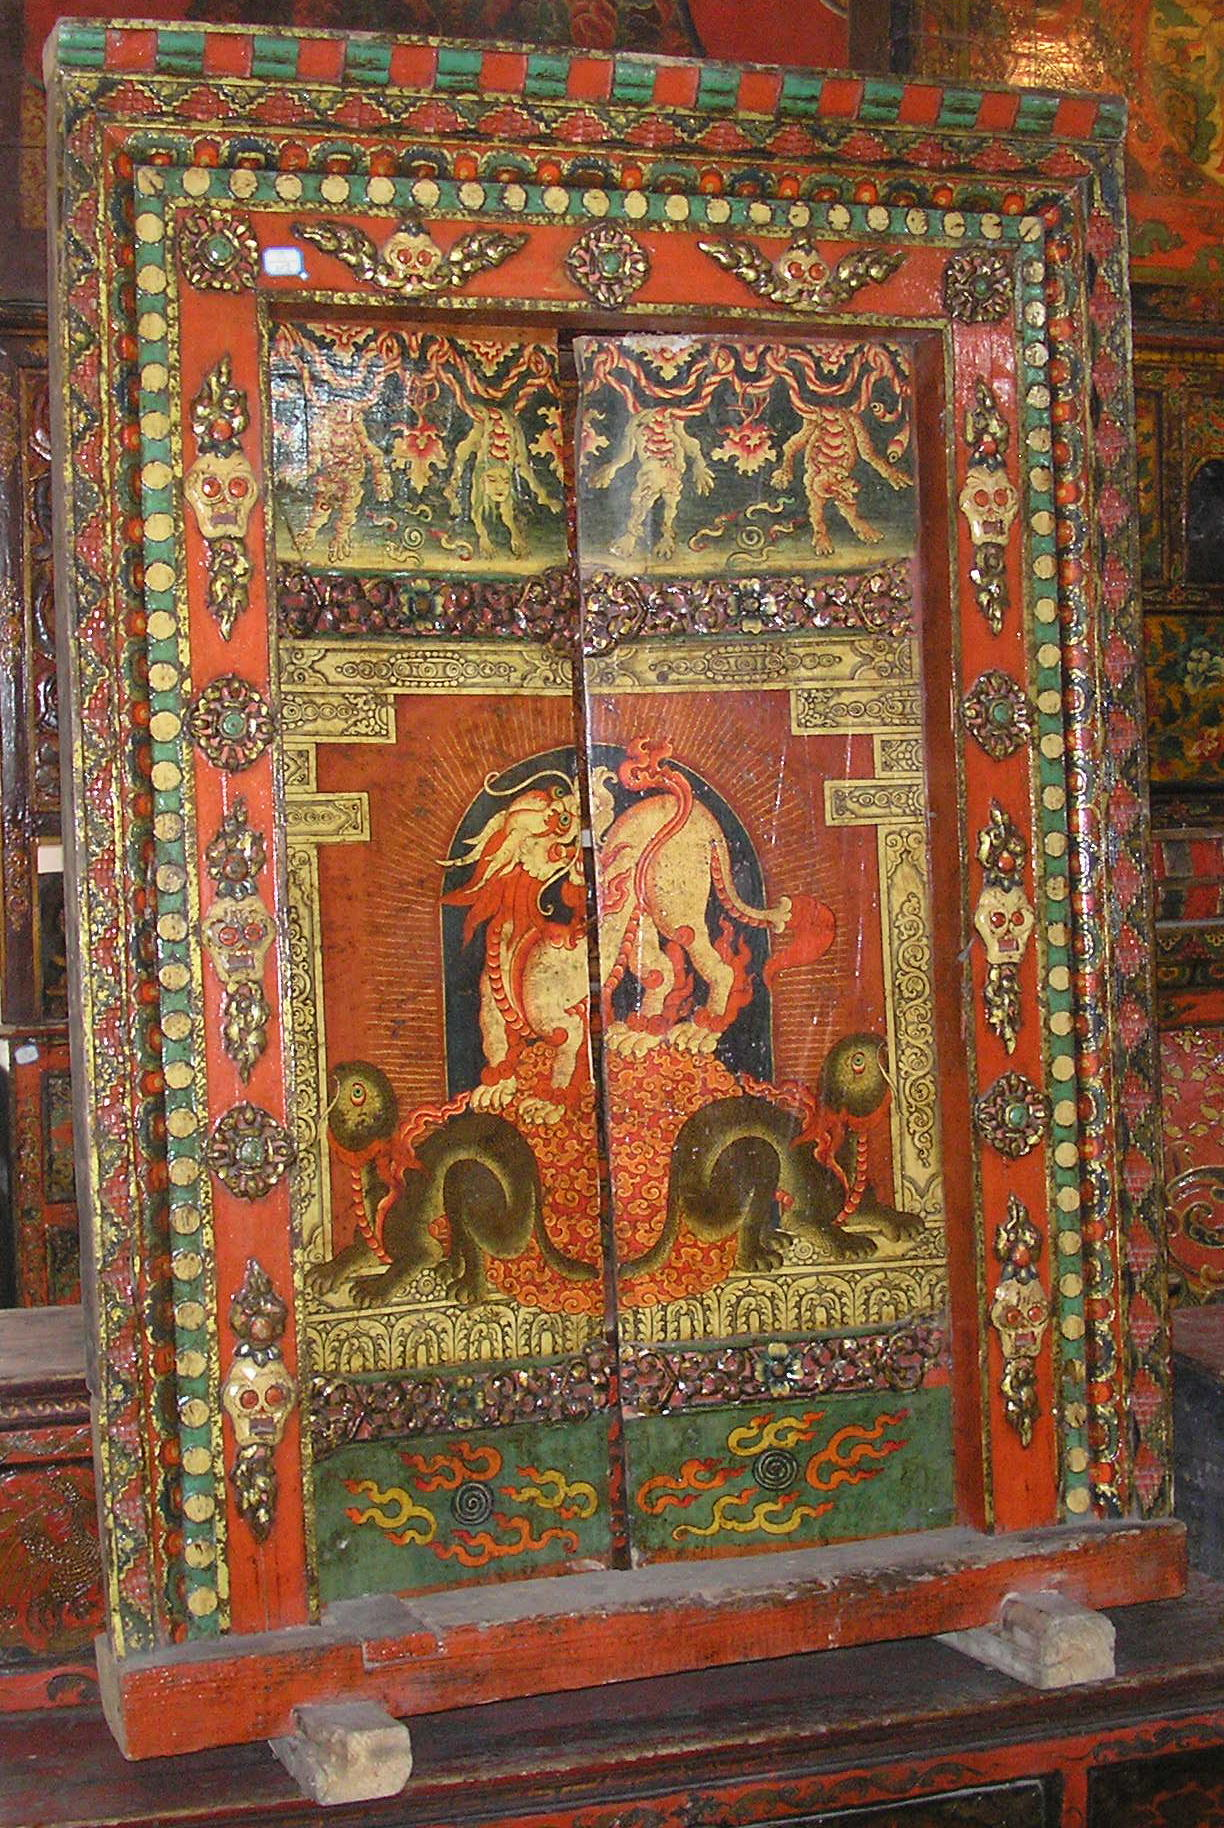 Latitudini mobili le tipologie dei mobili tibetani - Mobili tibetani antichi ...